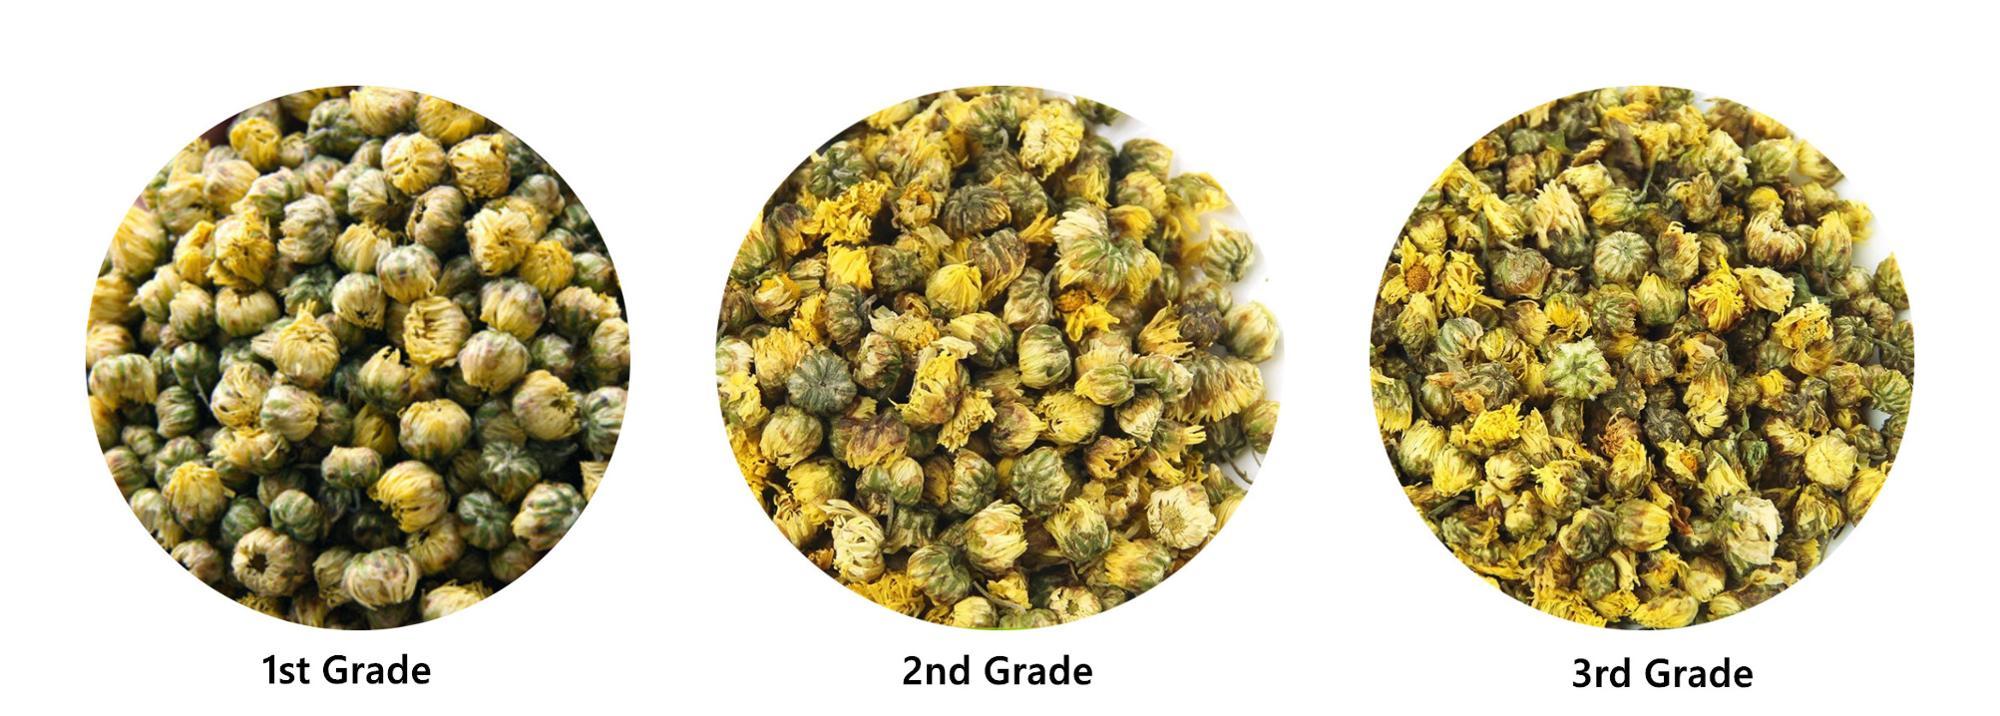 Chinese Blooming Tea Honey Chrysanthemum Tea with OEM Private Labeling Package - 4uTea | 4uTea.com